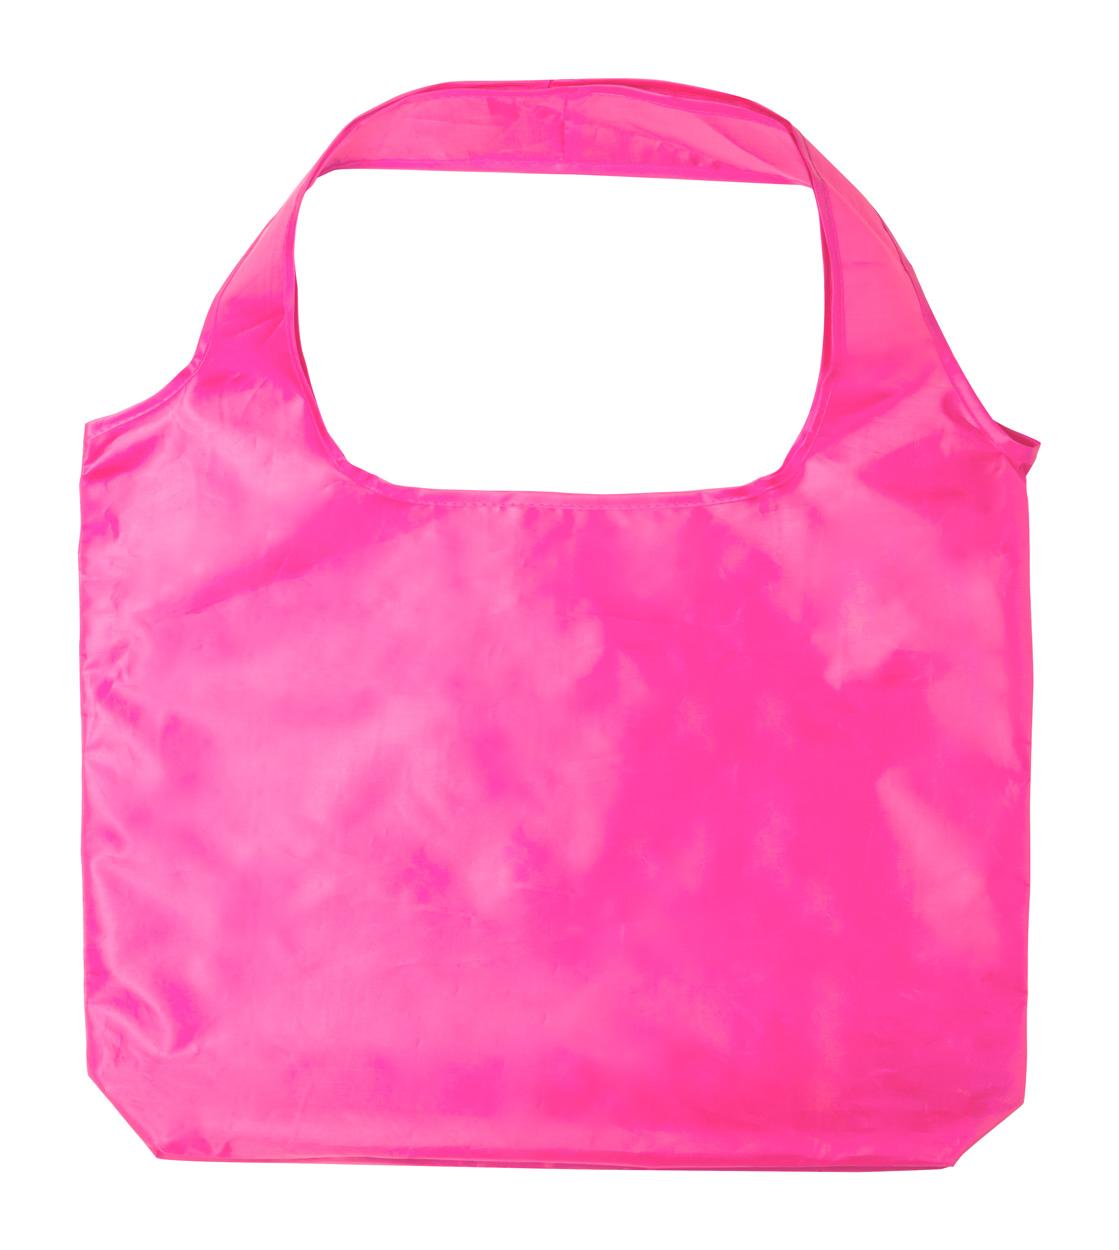 Karent foldable shopping bag